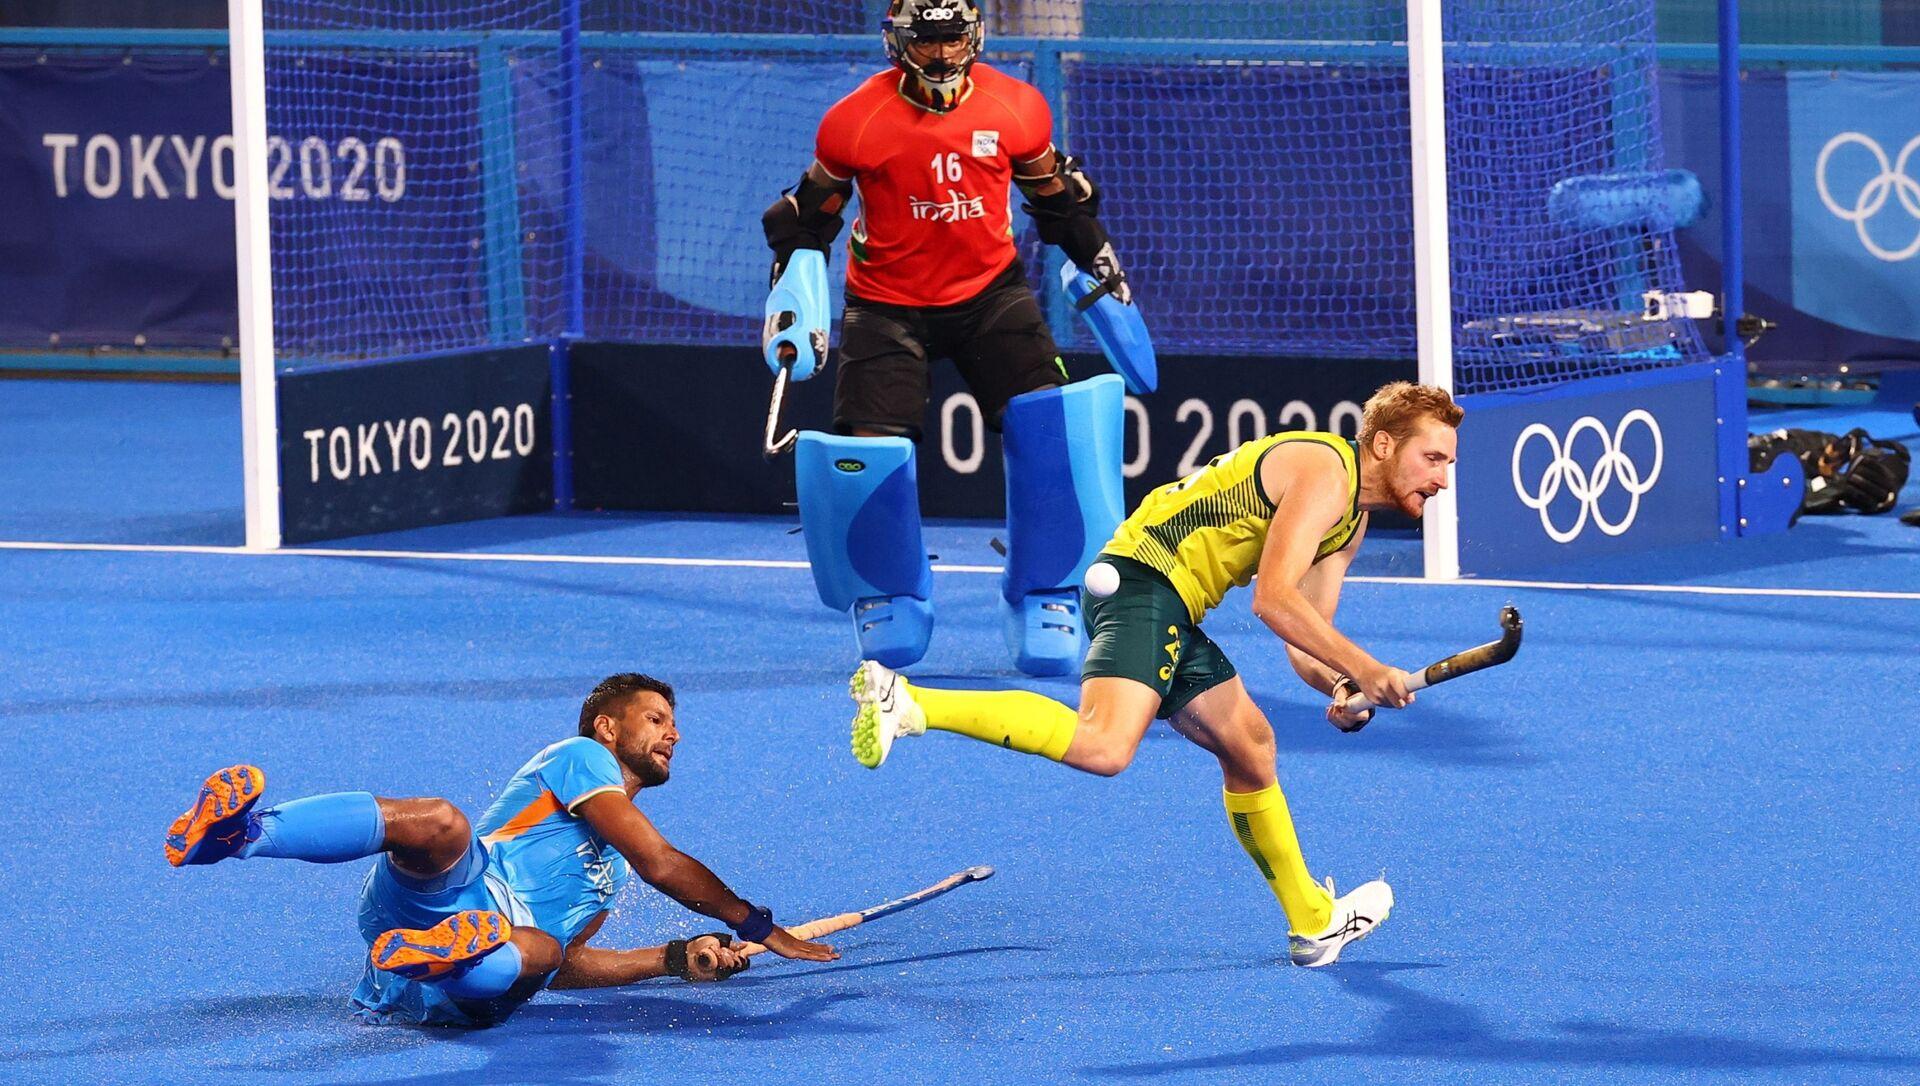 Tokyo 2020 Olympics - Hockey - Men's Pool A - India v Australia - Oi Hockey Stadium, Tokyo, Japan - July 25, 2021. Rupinder Pal Singh of India in action with Daniel Beale of Australia. REUTERS/Bernadett Szabo - Sputnik International, 1920, 25.07.2021